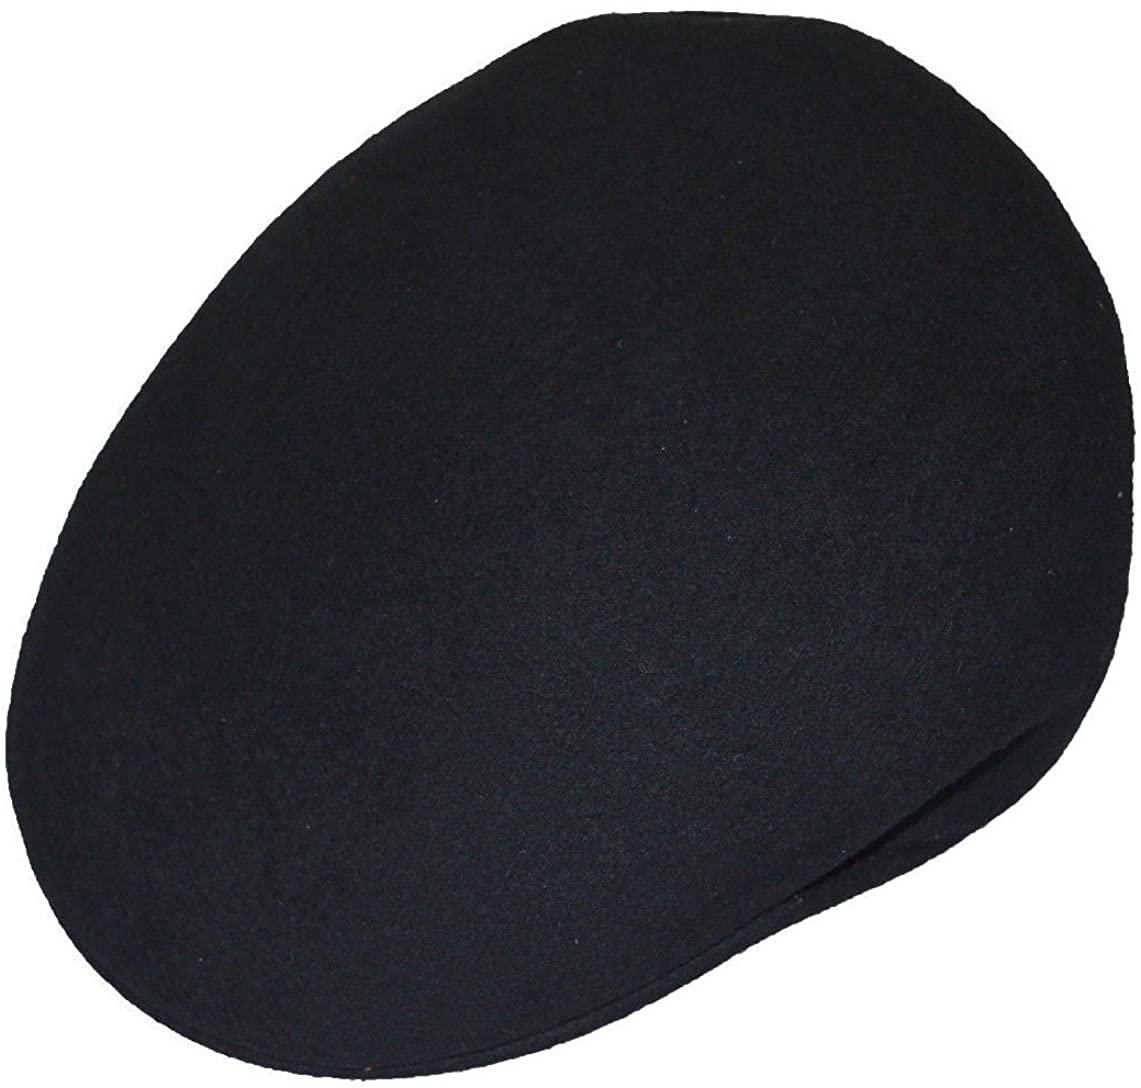 Scala Men's 100% Felt Wool Ivy Crushable Water Repellent Cap 2xlarge Black